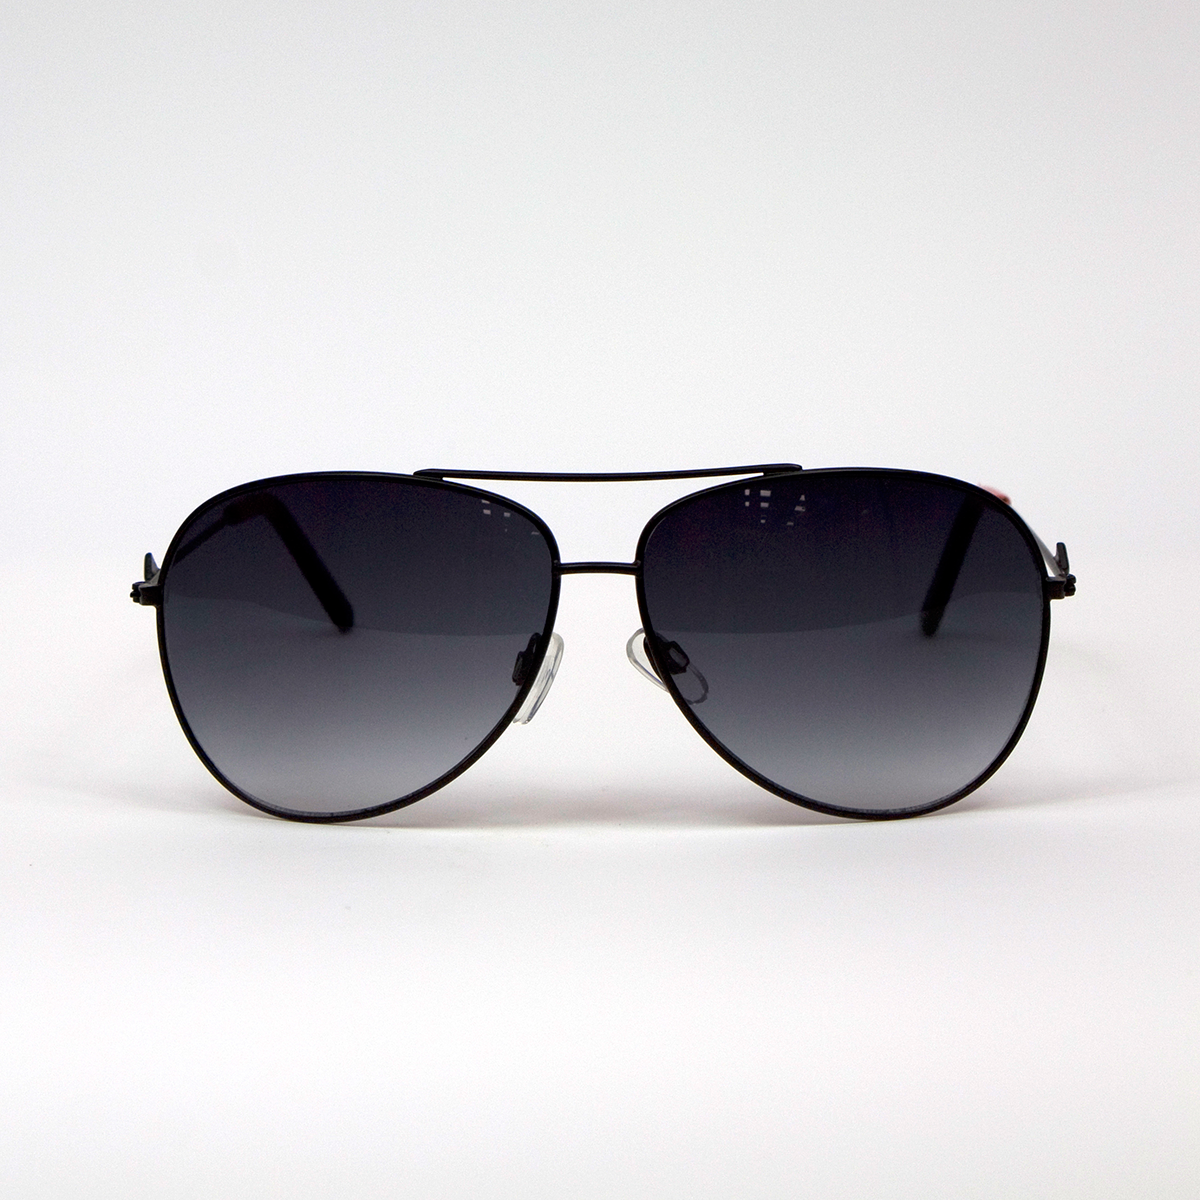 884fe9ddd7 Sunglasses Clip Art Men Very stylish